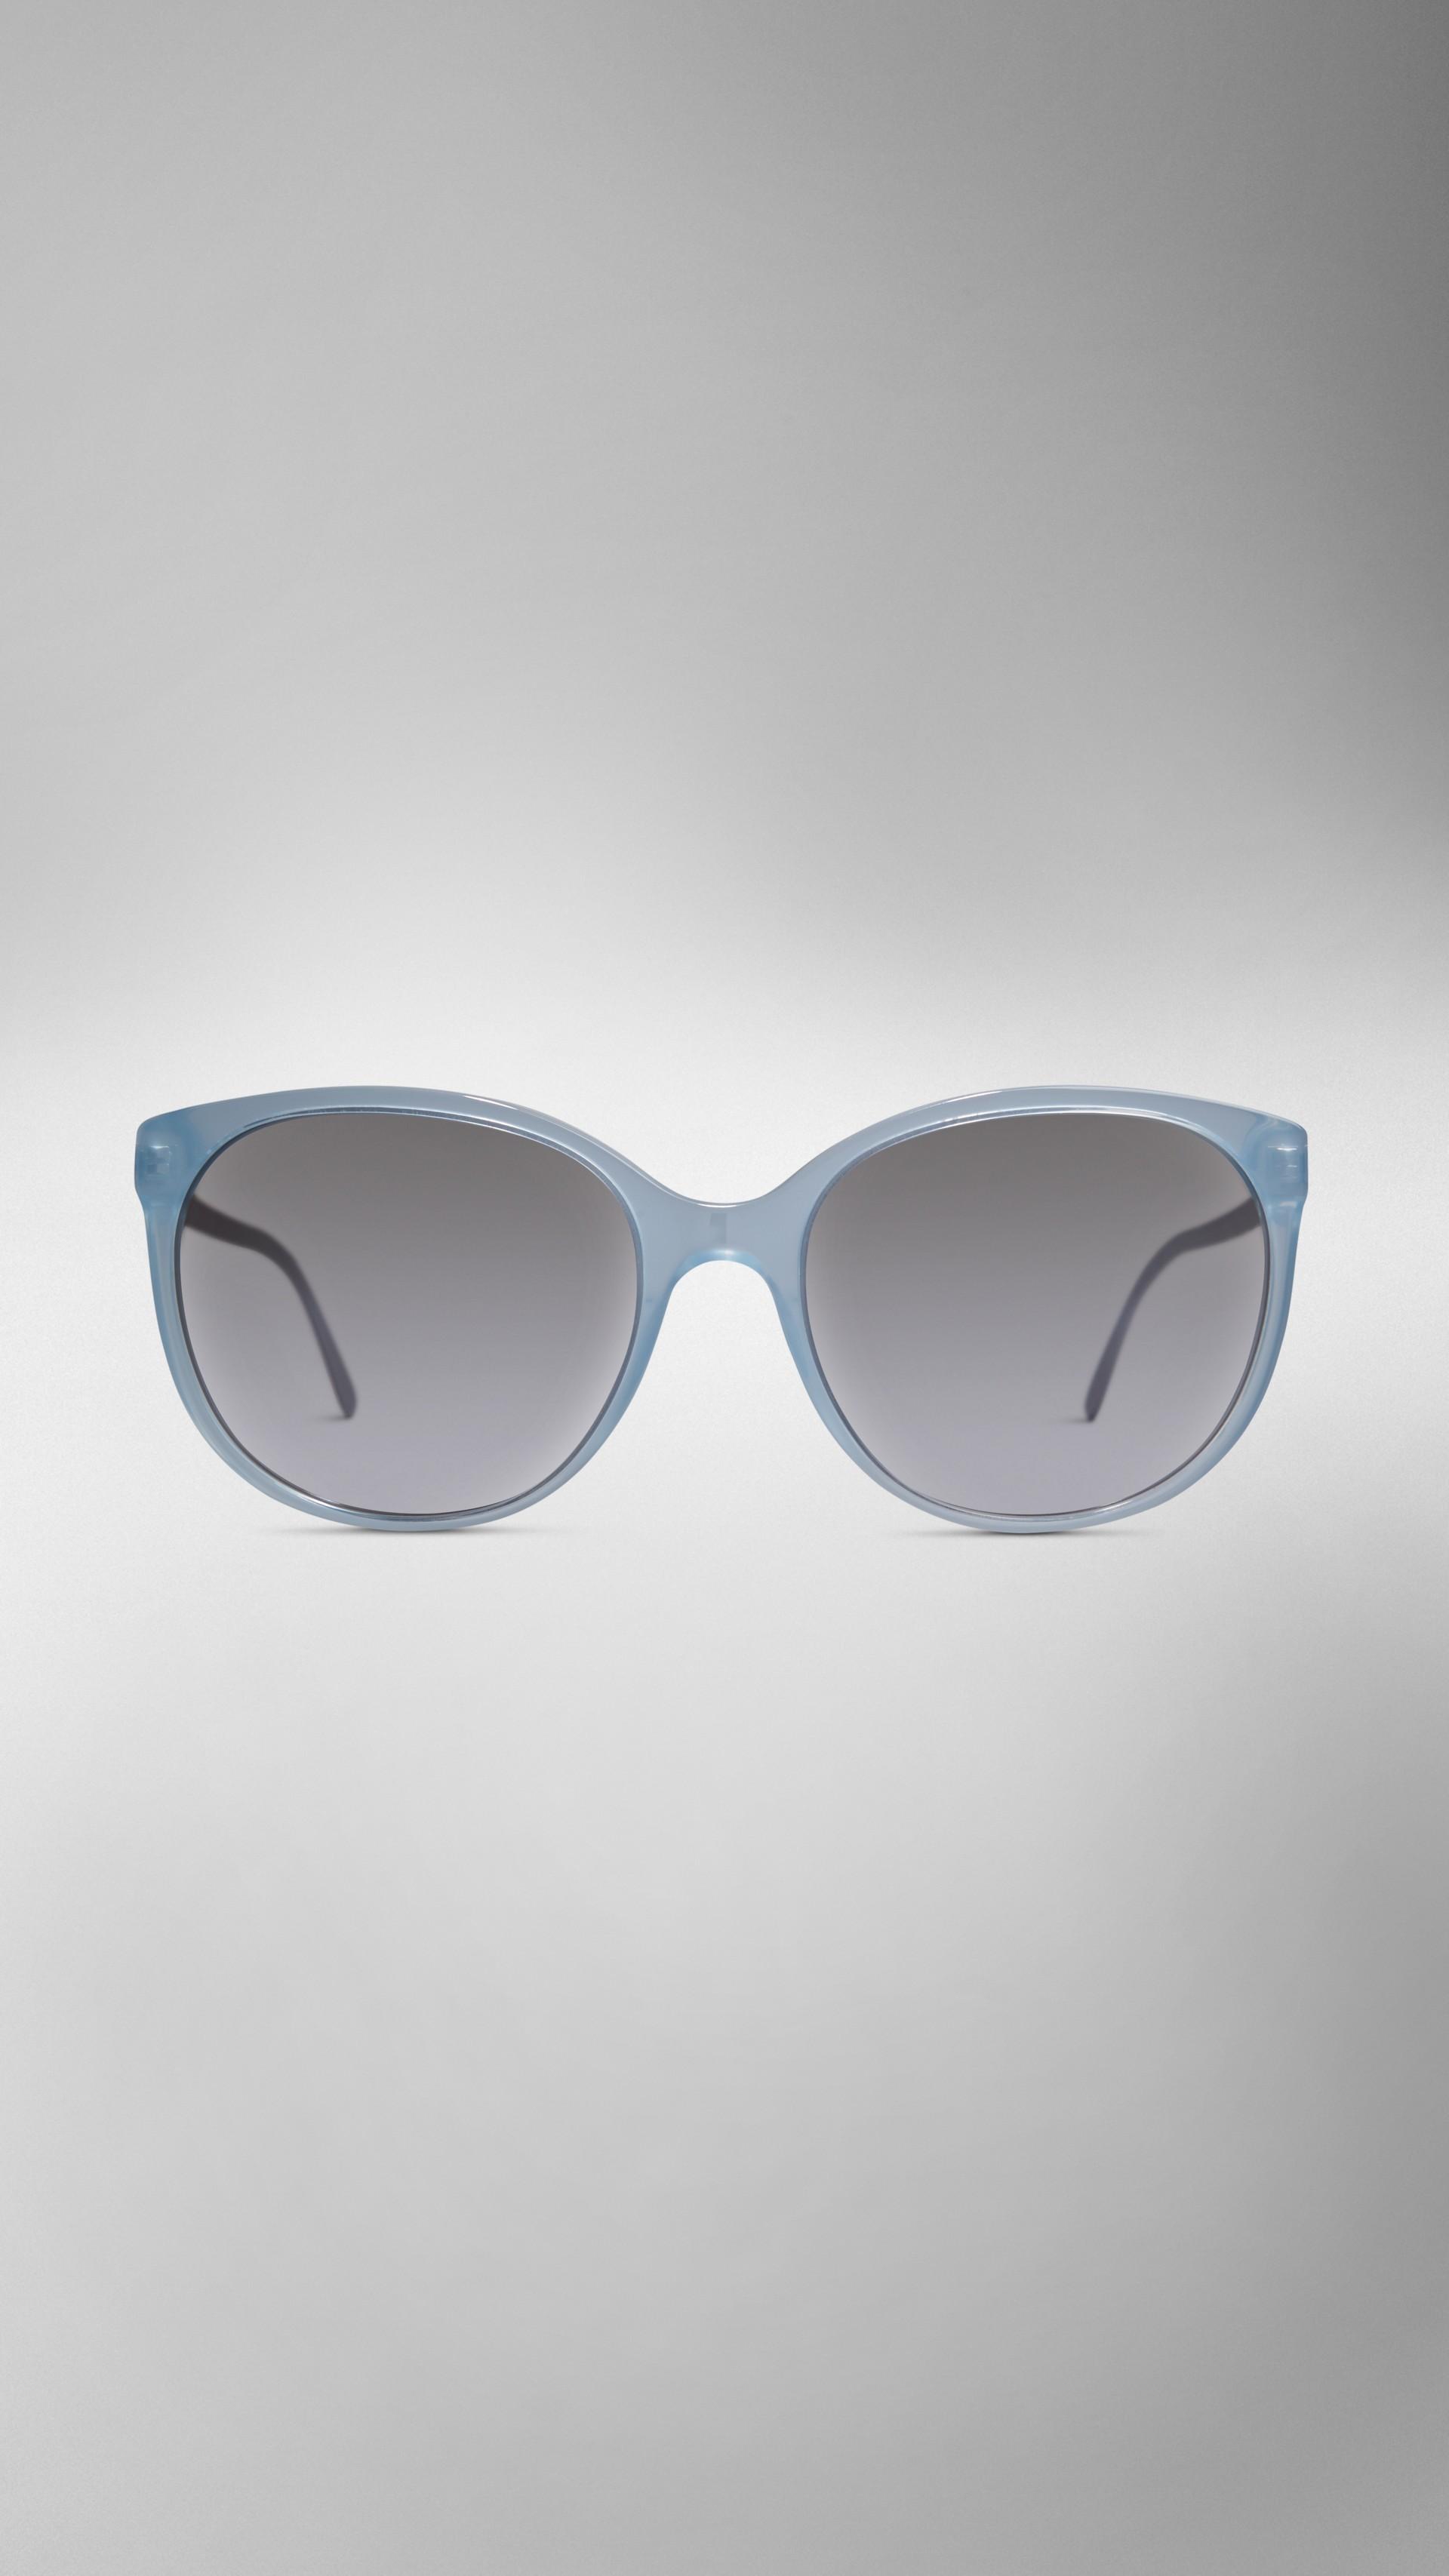 55f43f4597f Spark Cat-Eye Sunglasses in Light Blue - Women